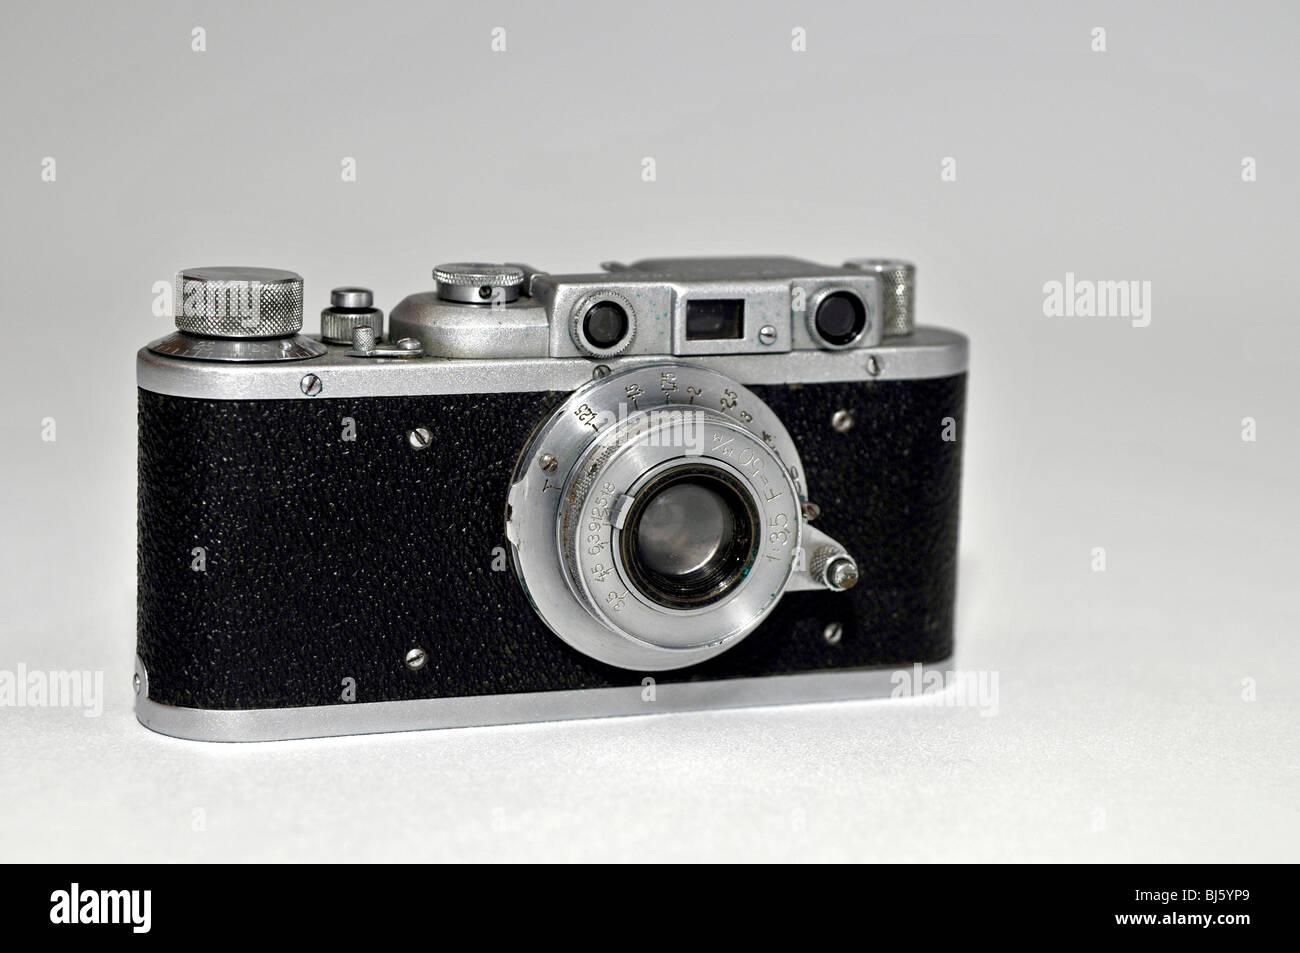 Old Soviet photo camera FED - Stock Image